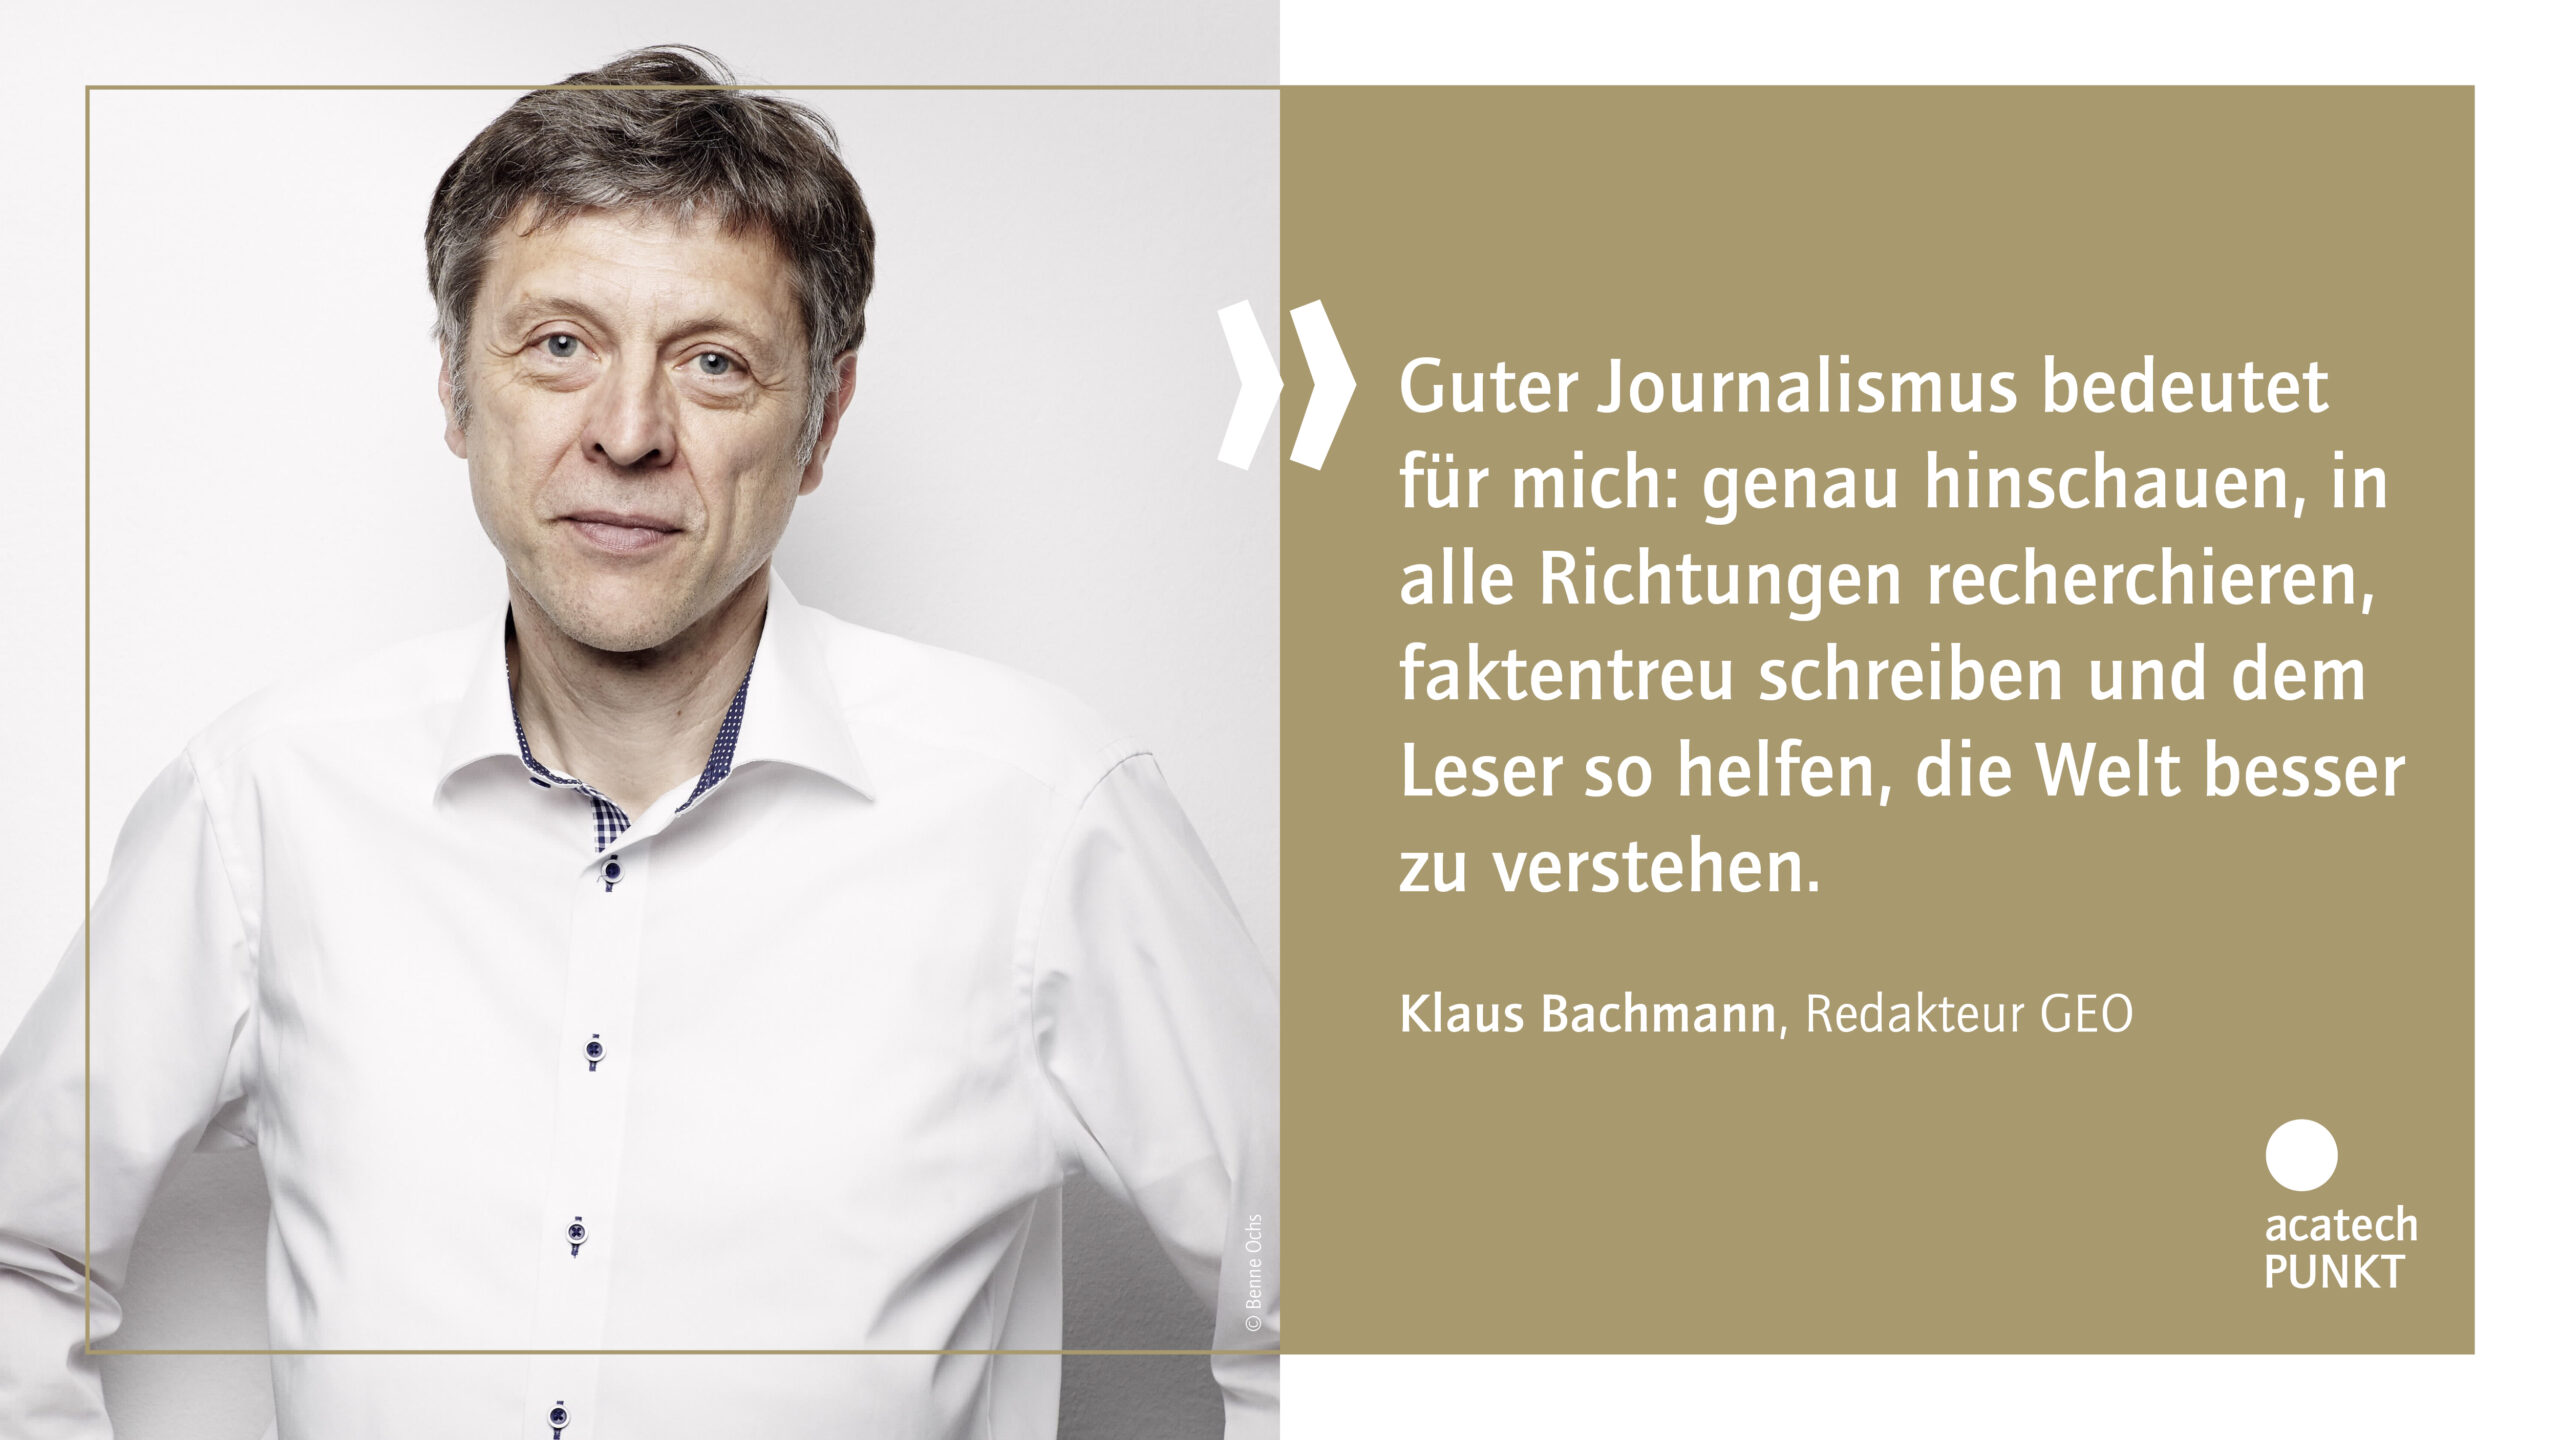 Zitatkarte mit Portraitbild Klaus Bachmann, GEO